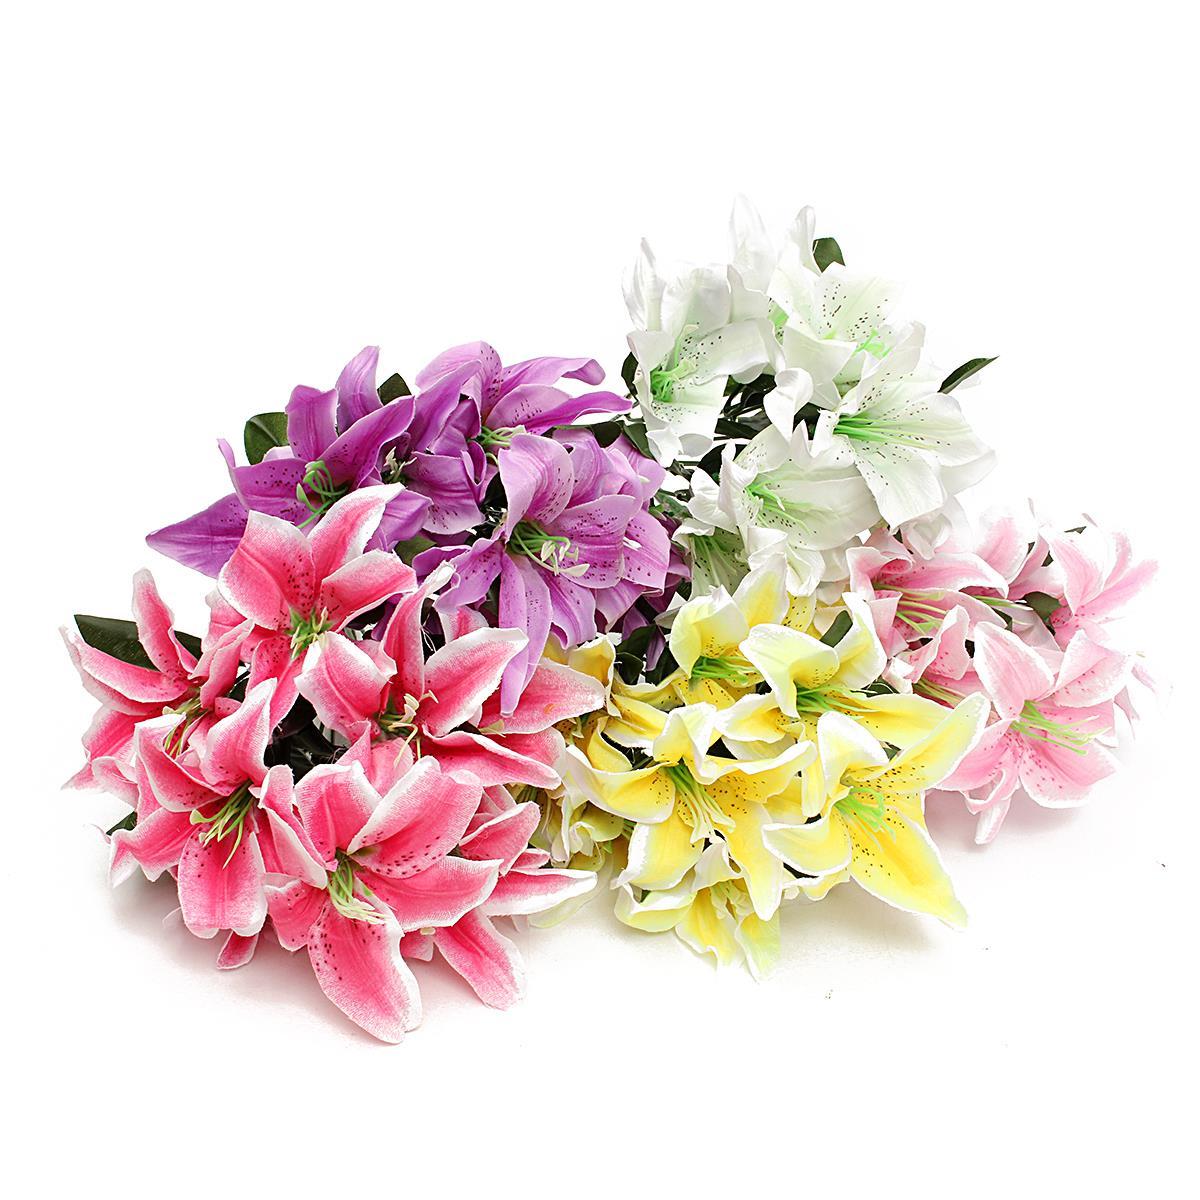 Fake flowers for crafts - 10 Heads Silk Flower Bunch Artificial Lilies Bouquet Home Wedding Garden Floral Decorative Crafts Accessories Home